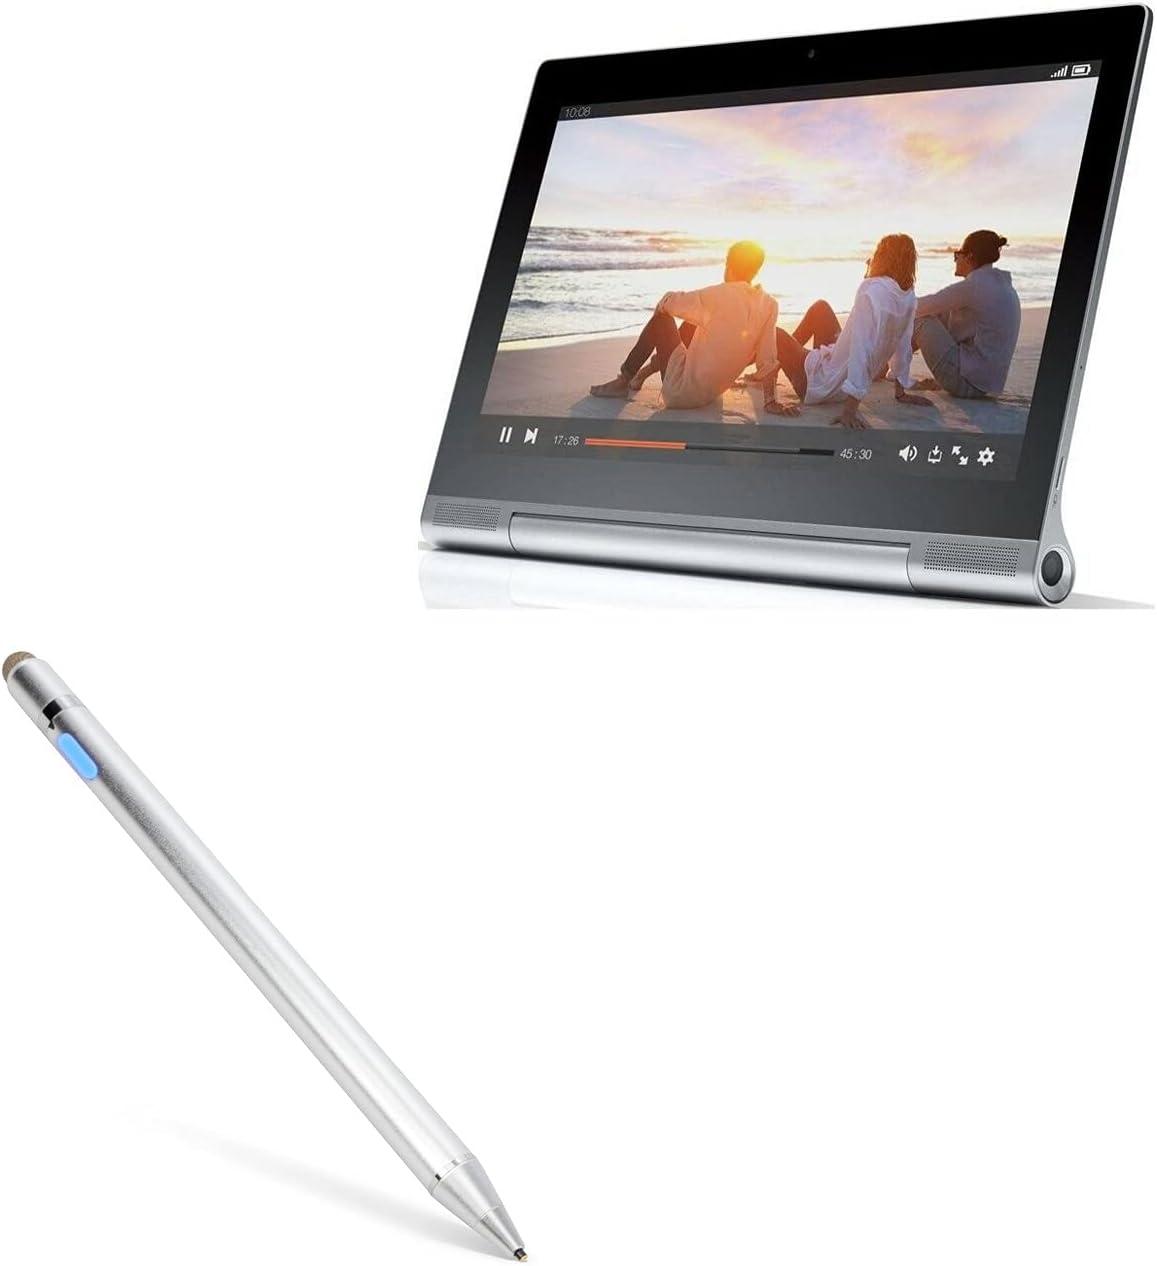 Stylus Pen for Lenovo Yoga Tablet 2 Pro (Stylus Pen by BoxWave) - AccuPoint Active Stylus, Electronic Stylus with Ultra Fine Tip for Lenovo Yoga Tablet 2 Pro - Metallic Silver